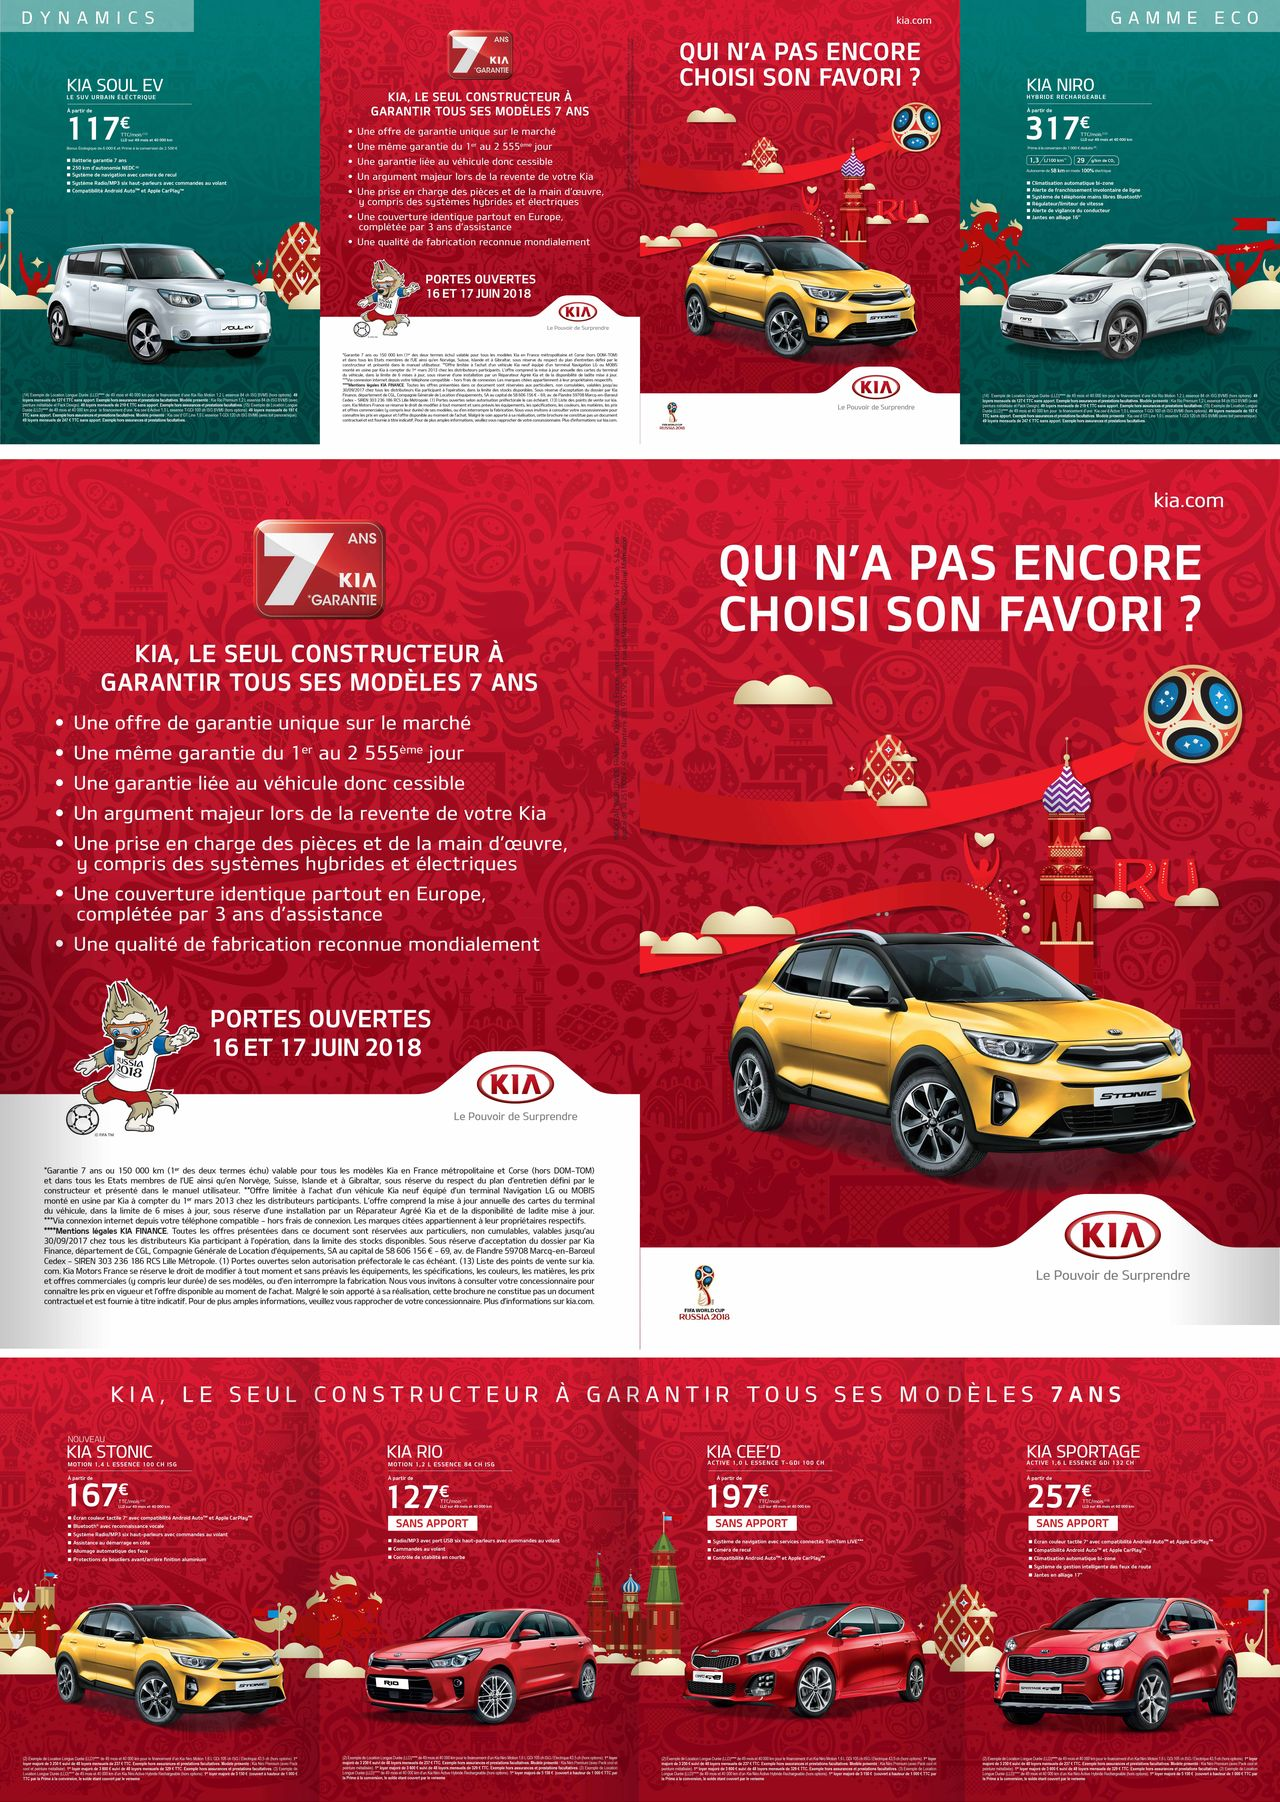 KIA - RUSSIA 2018 - Leaflet Gamme